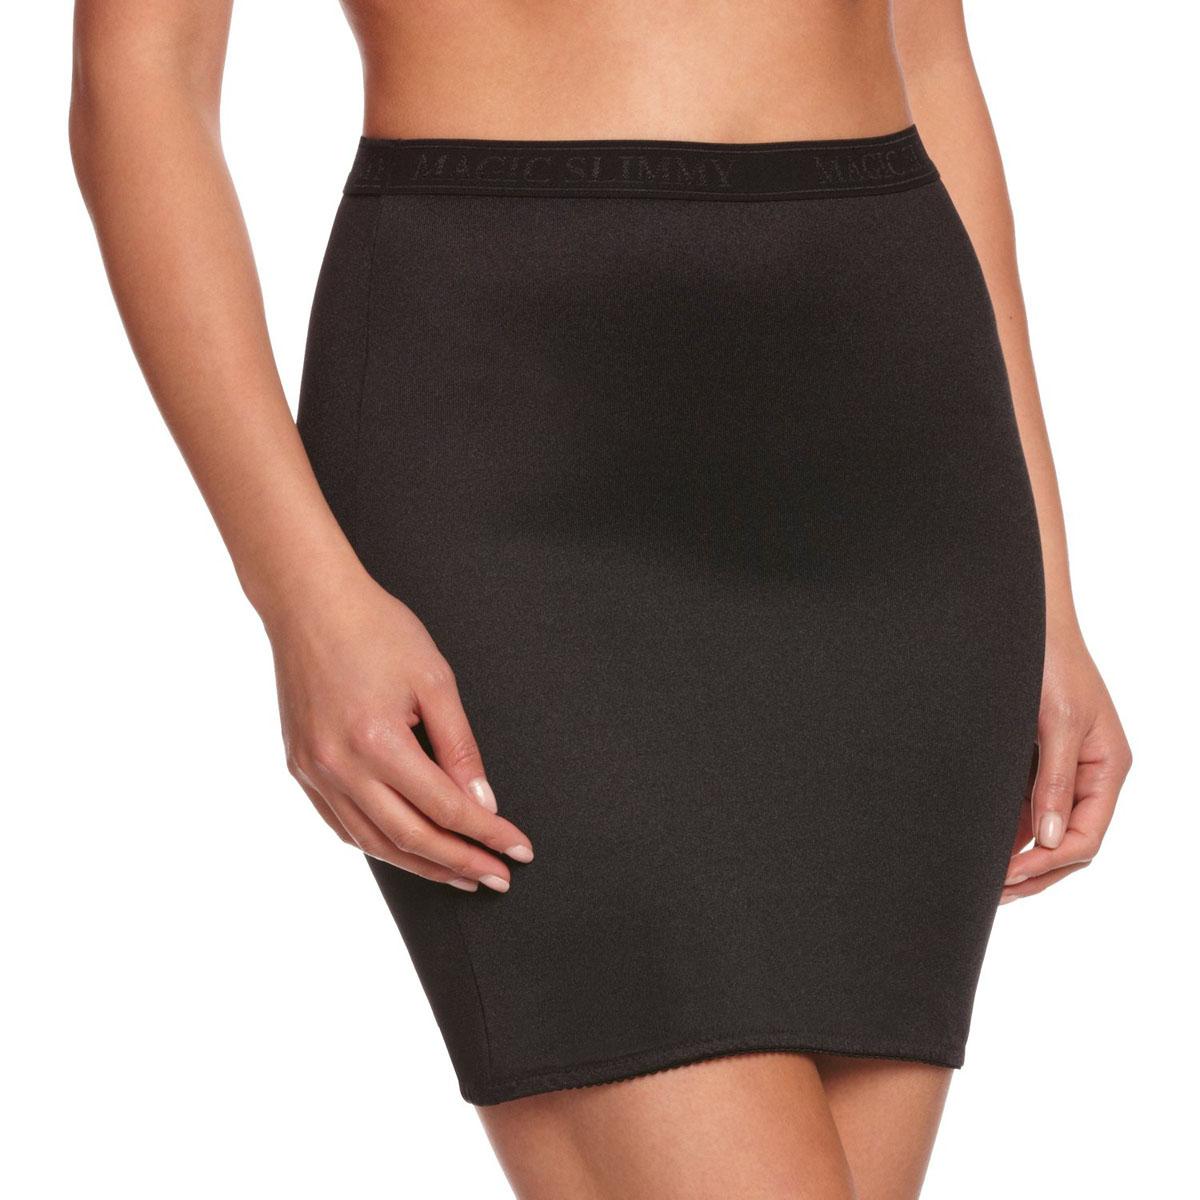 Юбка Magic BodyFashion Slimmy Skirt, корректирующая, цвет: черный. 10WL. Размер M (46)